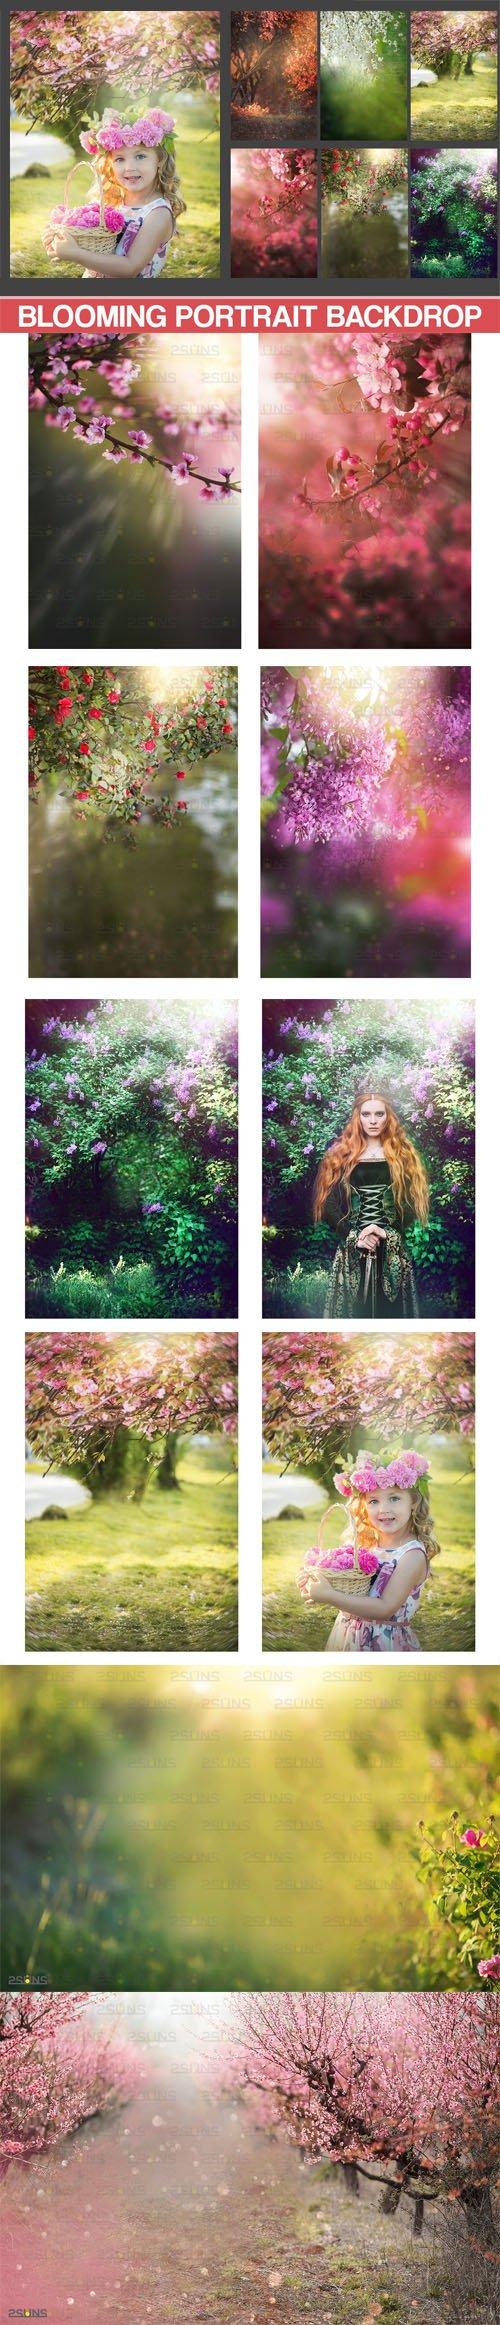 Blooming Portrait Backdrop Backgrounds Floral Art for Photoshop